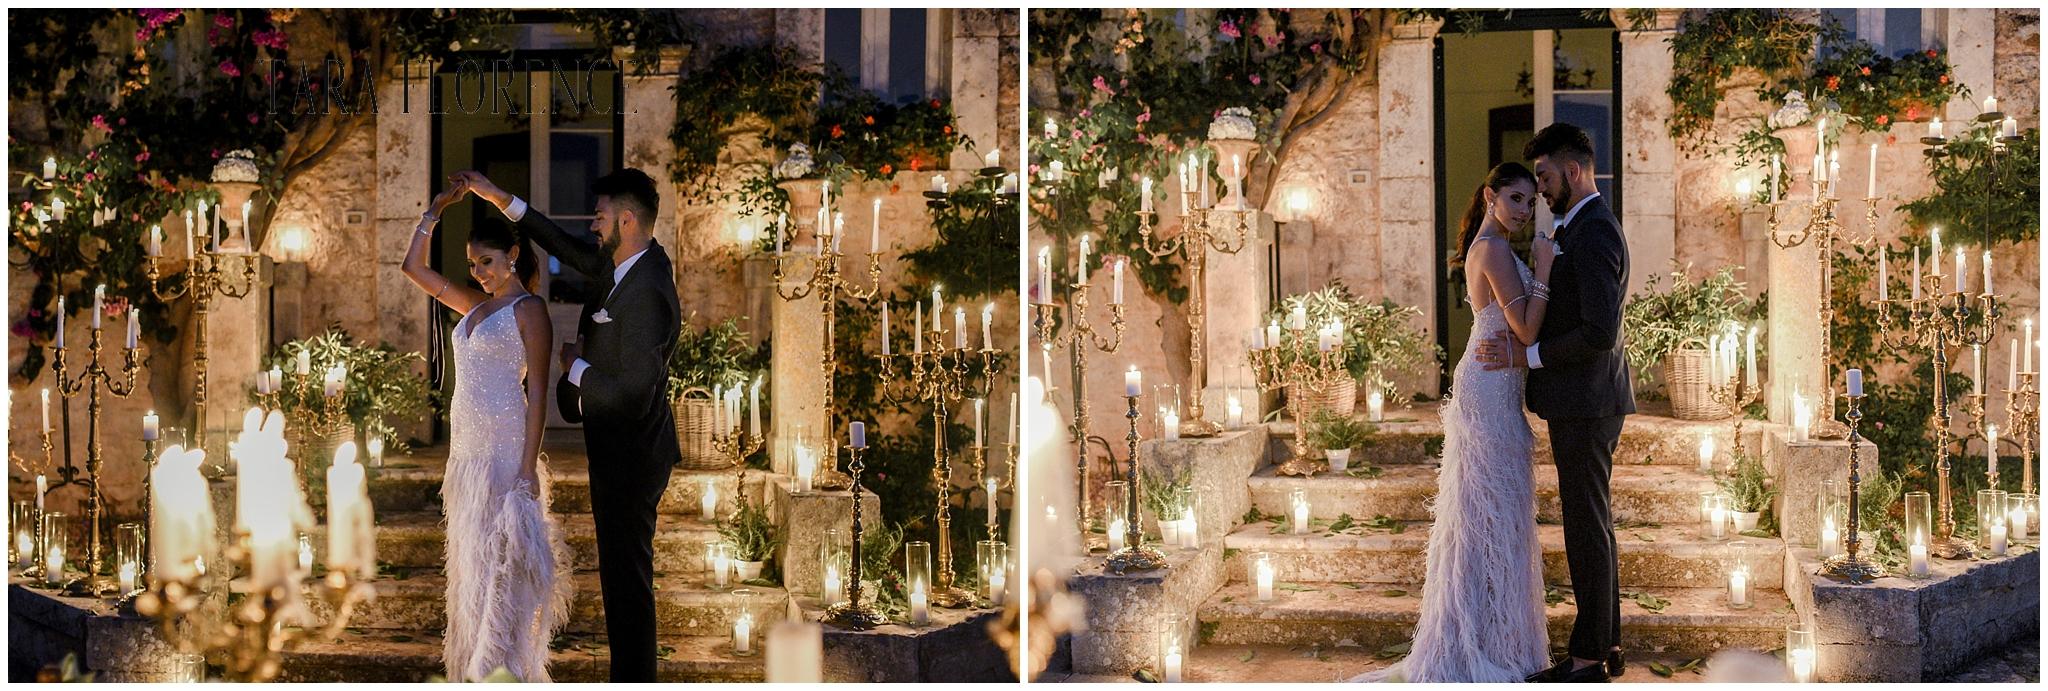 Puglia-Tara-Florence-Bridal-Editorial-186_WEB.jpg